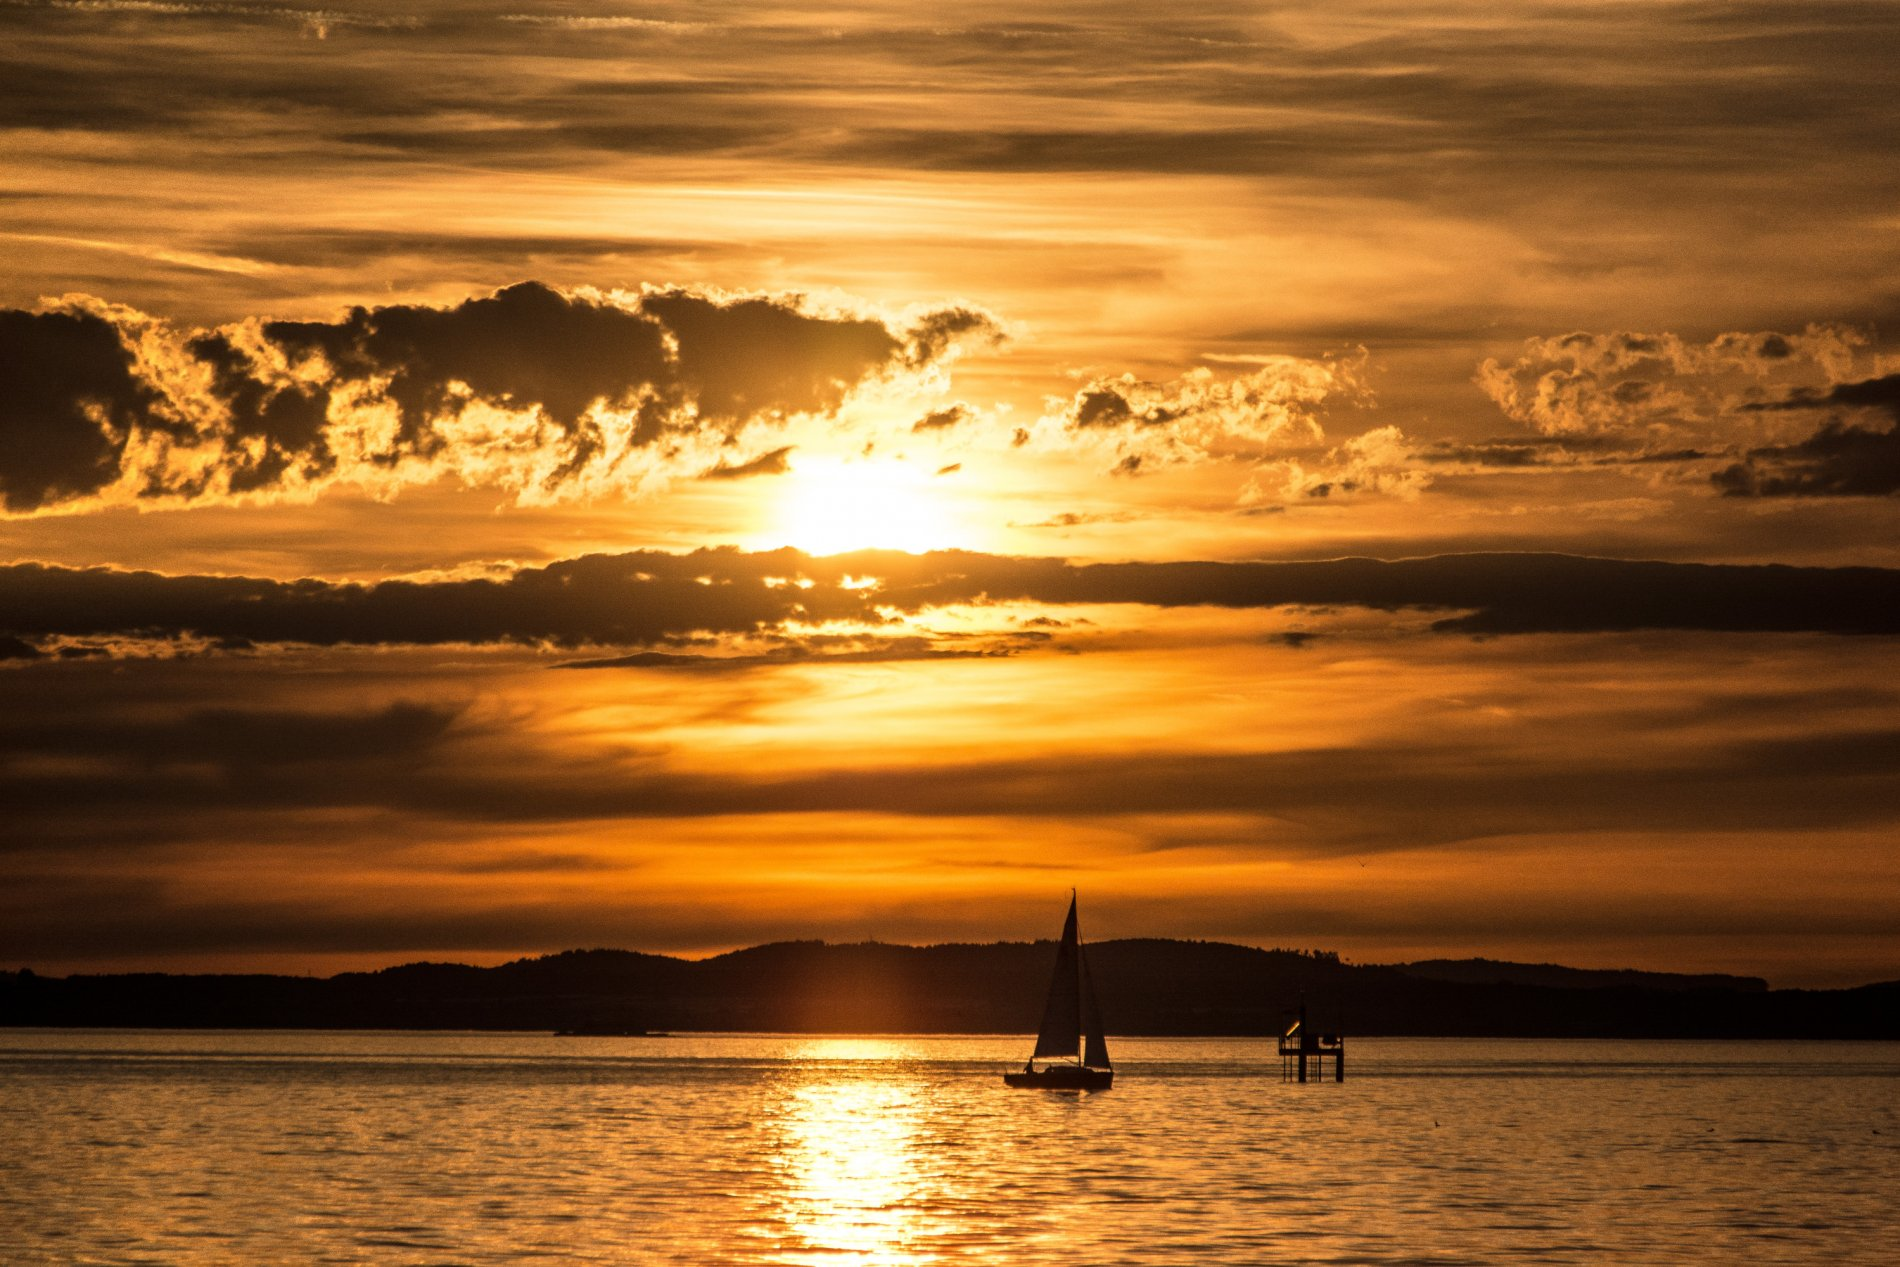 Sonnenuntergang vor Langenargen